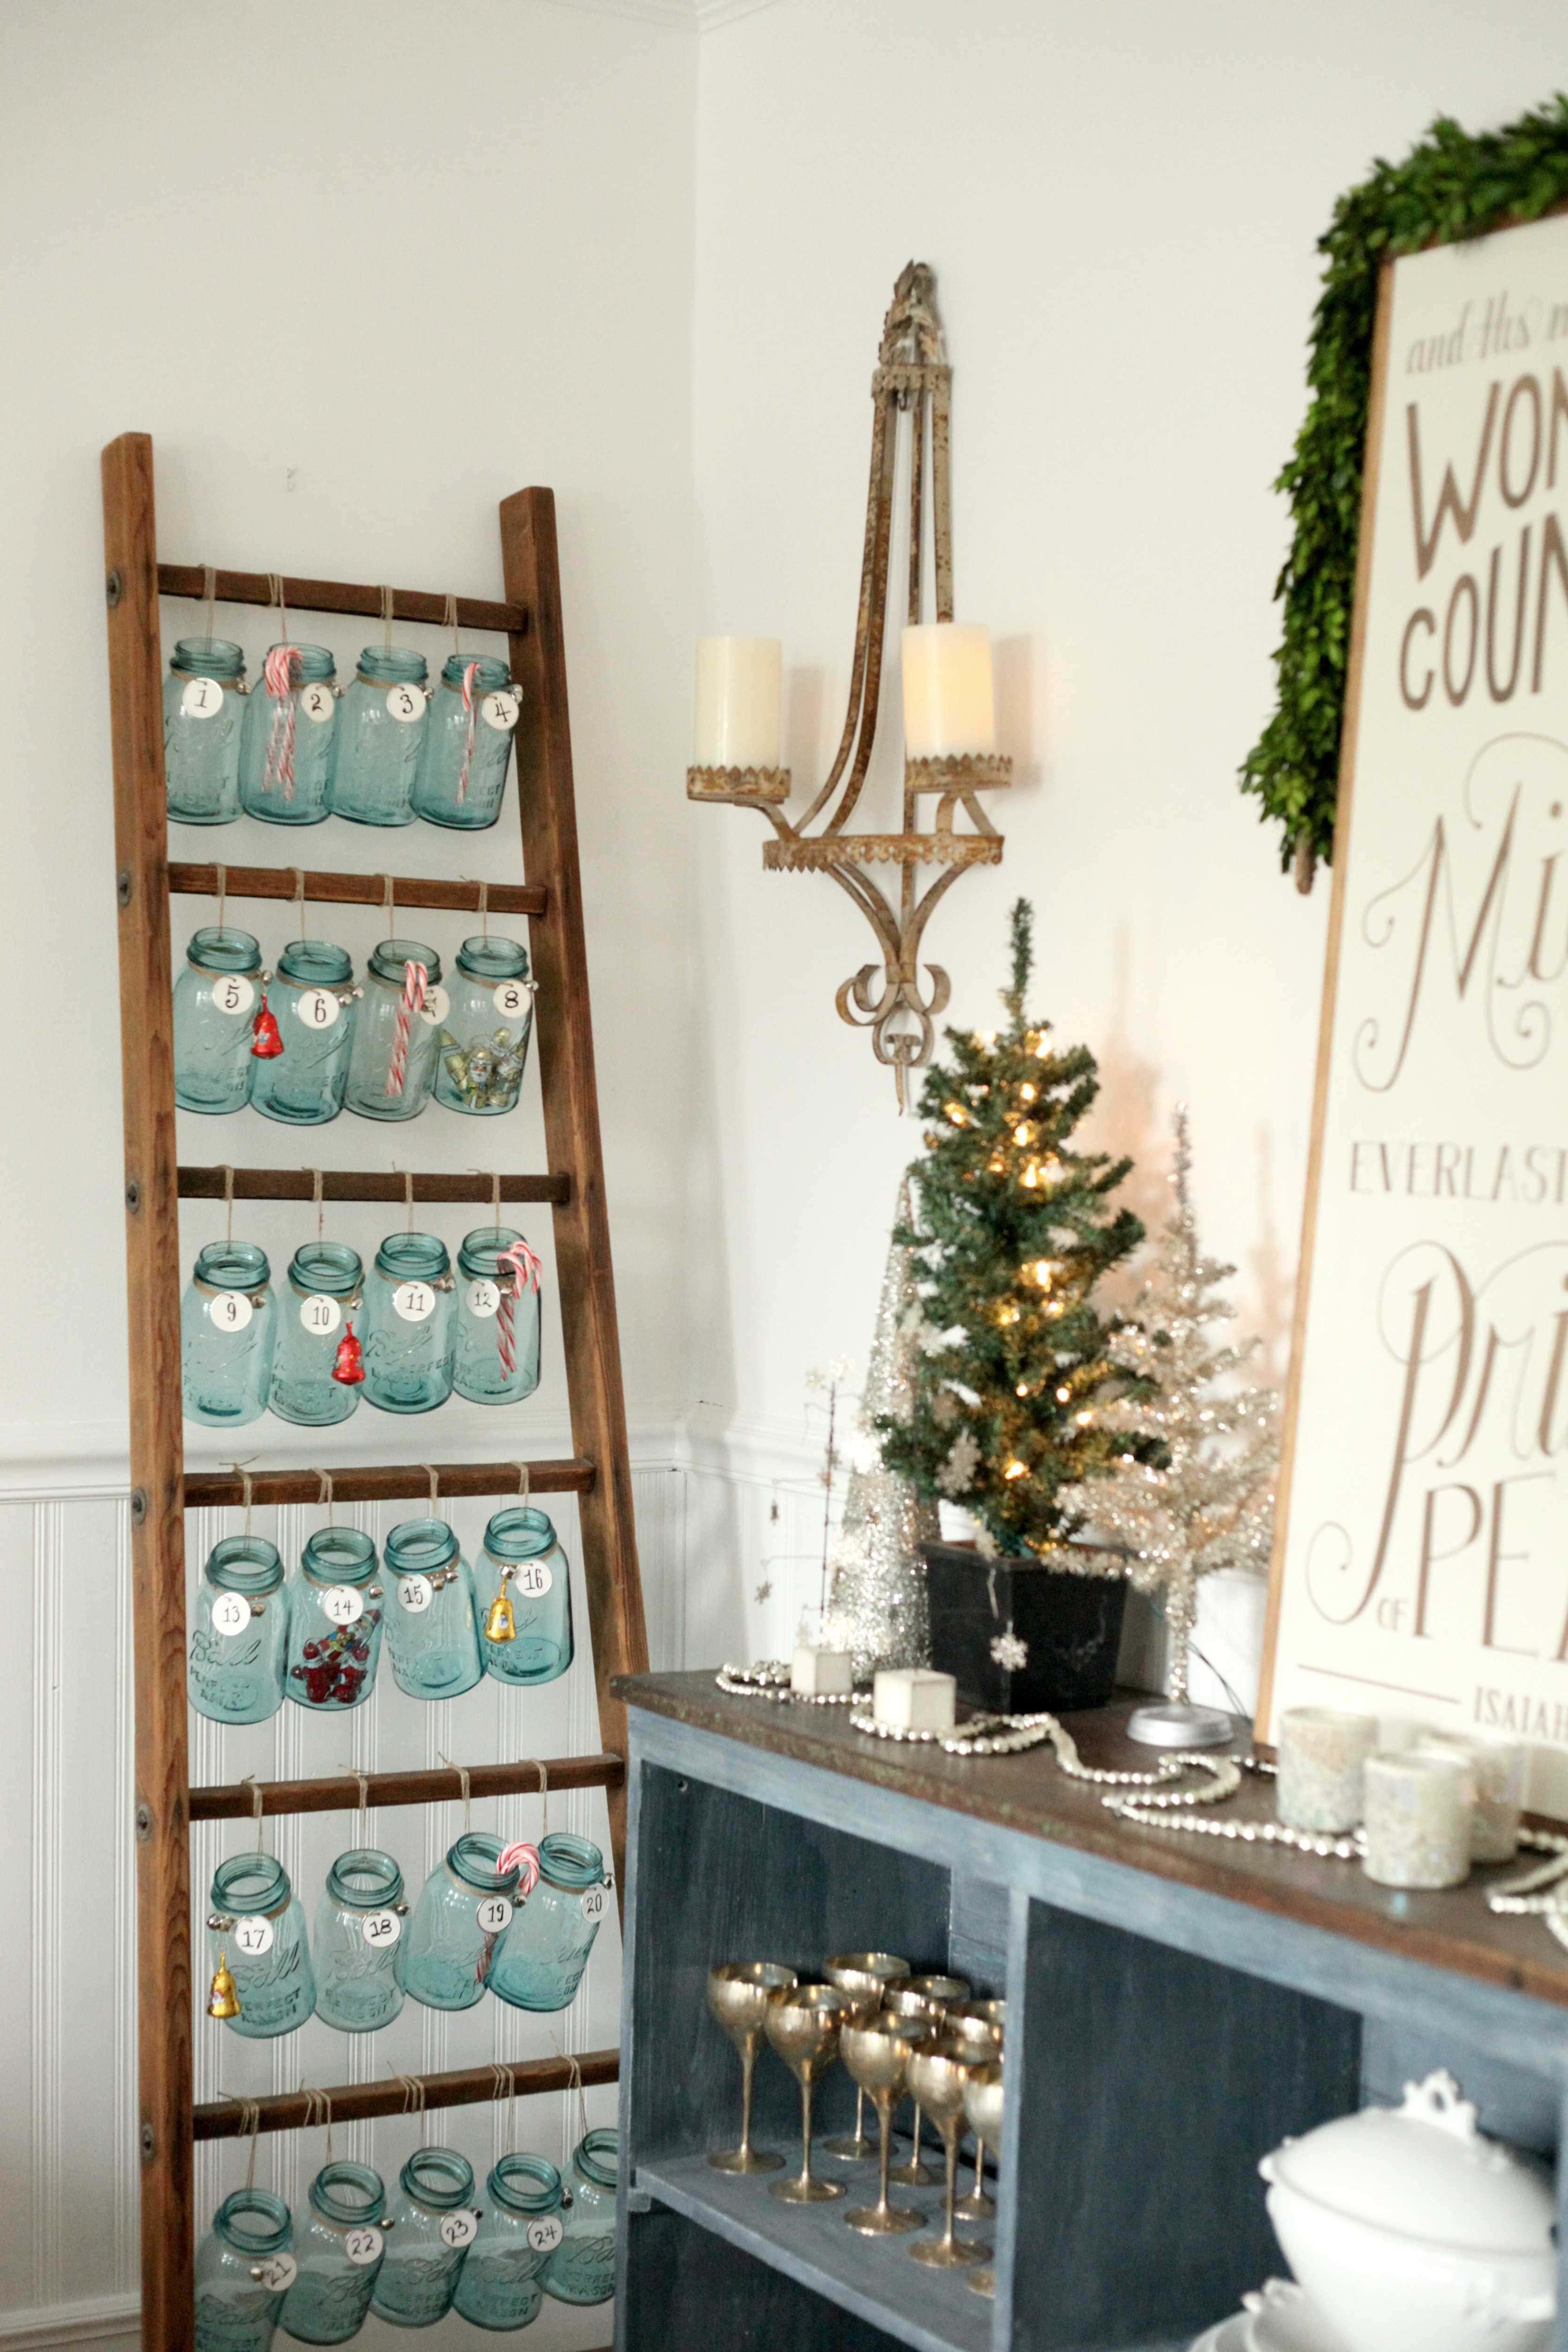 Antique Ladder and Mason Jar Advent Calendar